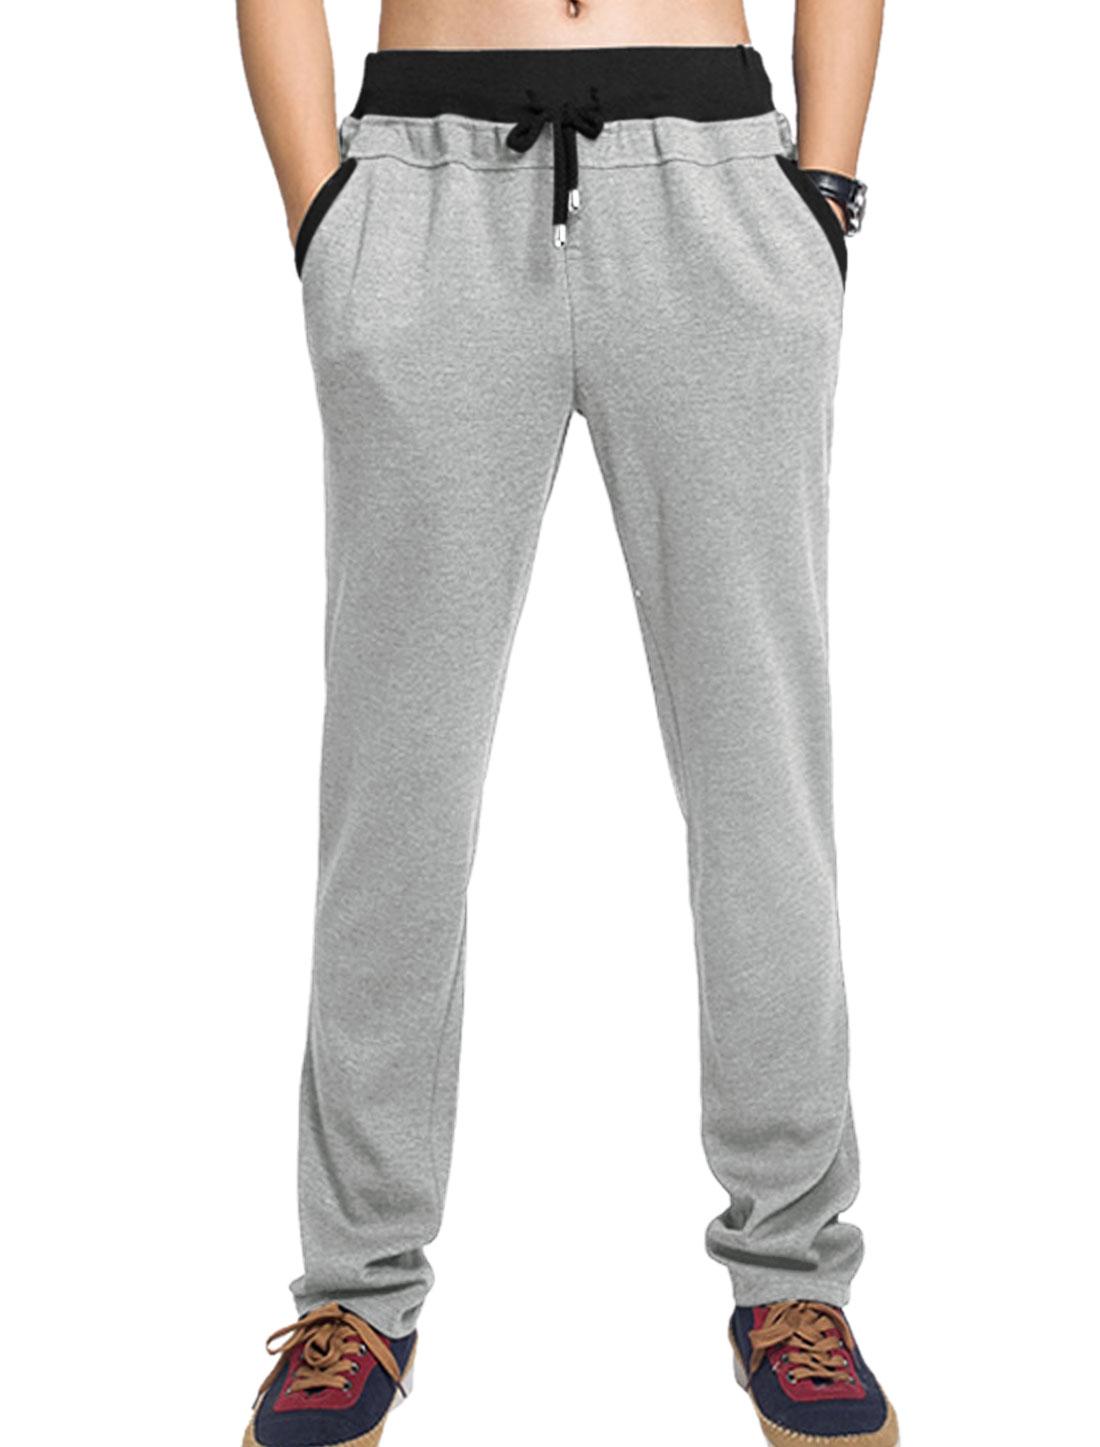 Men Slant Front Pockets Ribbed Waist Casual Pants Light Gray W32